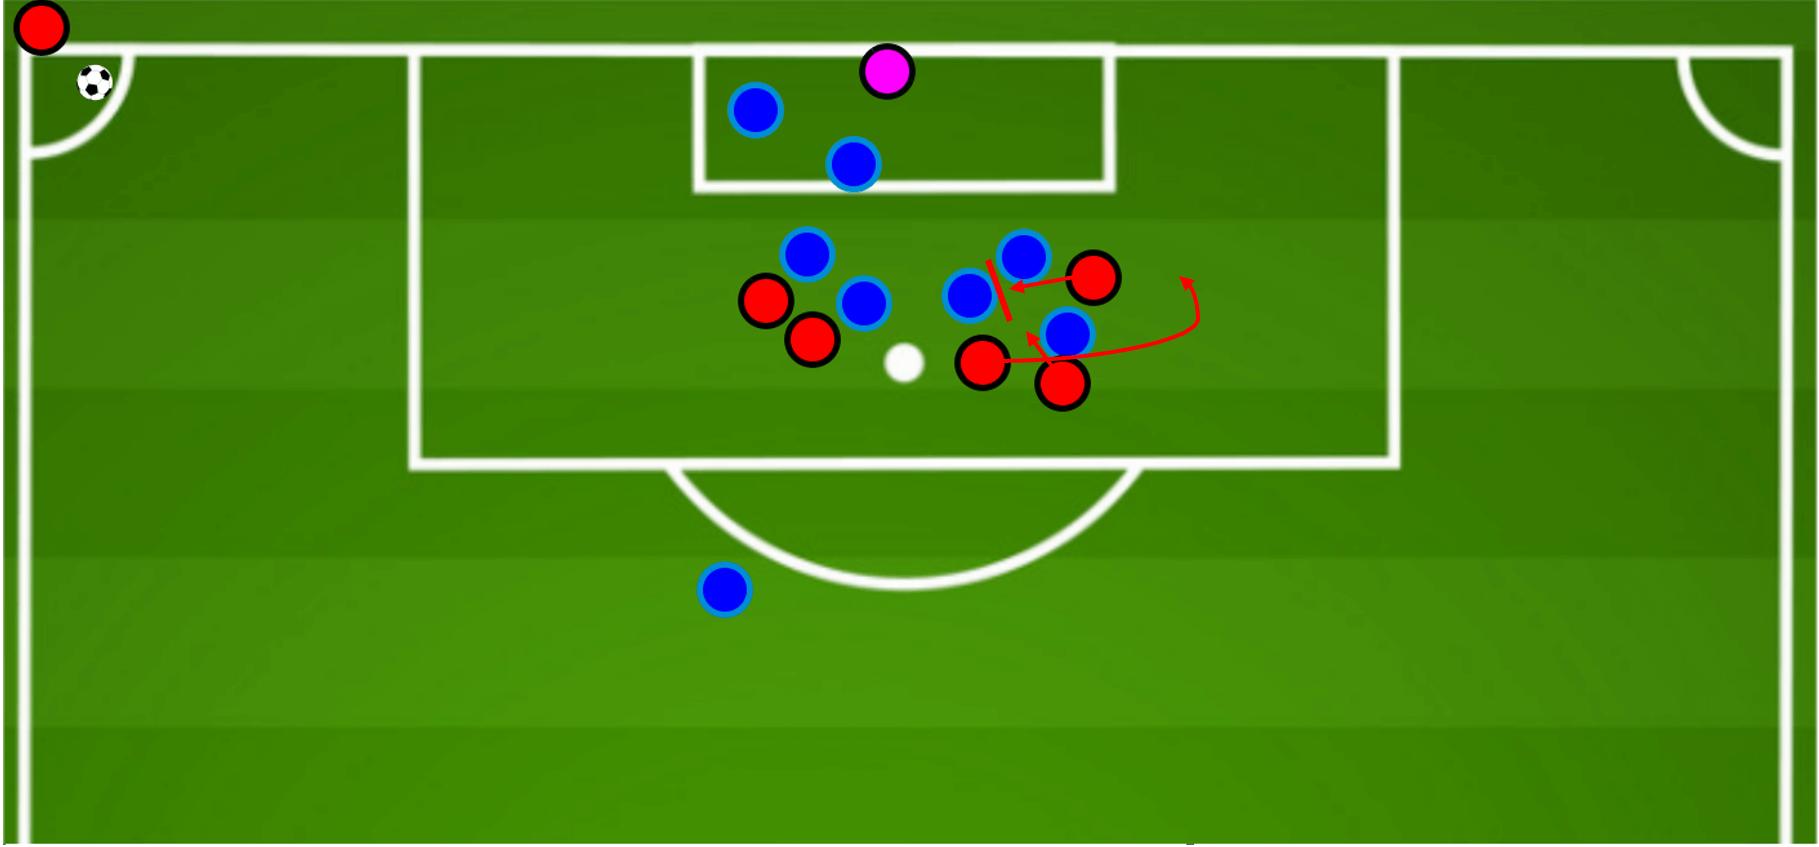 Tactical analysis: Using NFL plays to improve set-pieces in football (Part 2) tactics